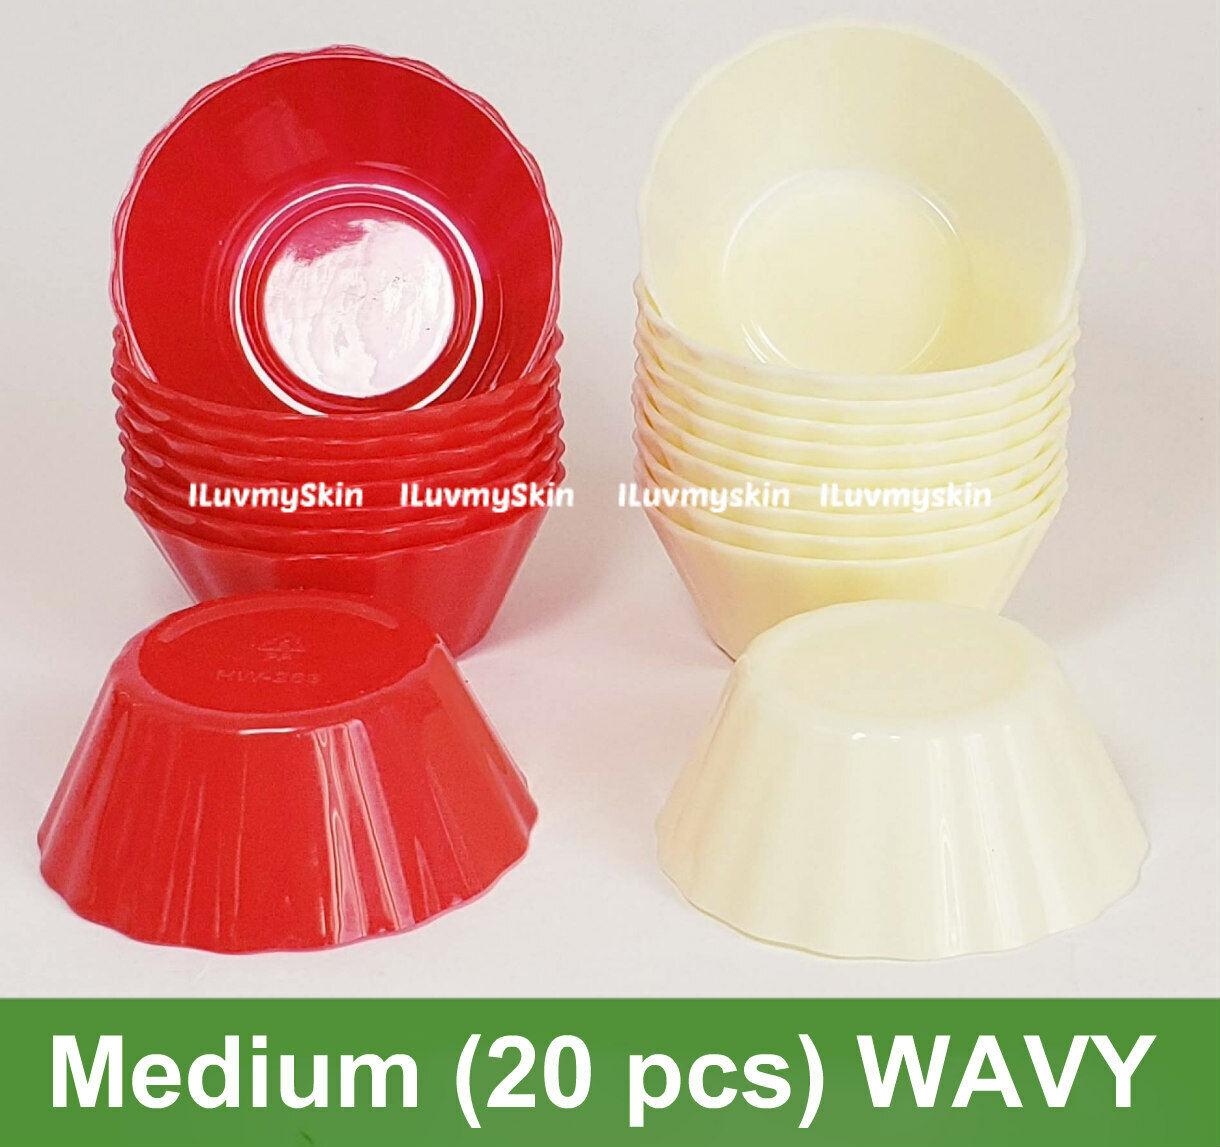 Medium (20 pieces) WAVY Style